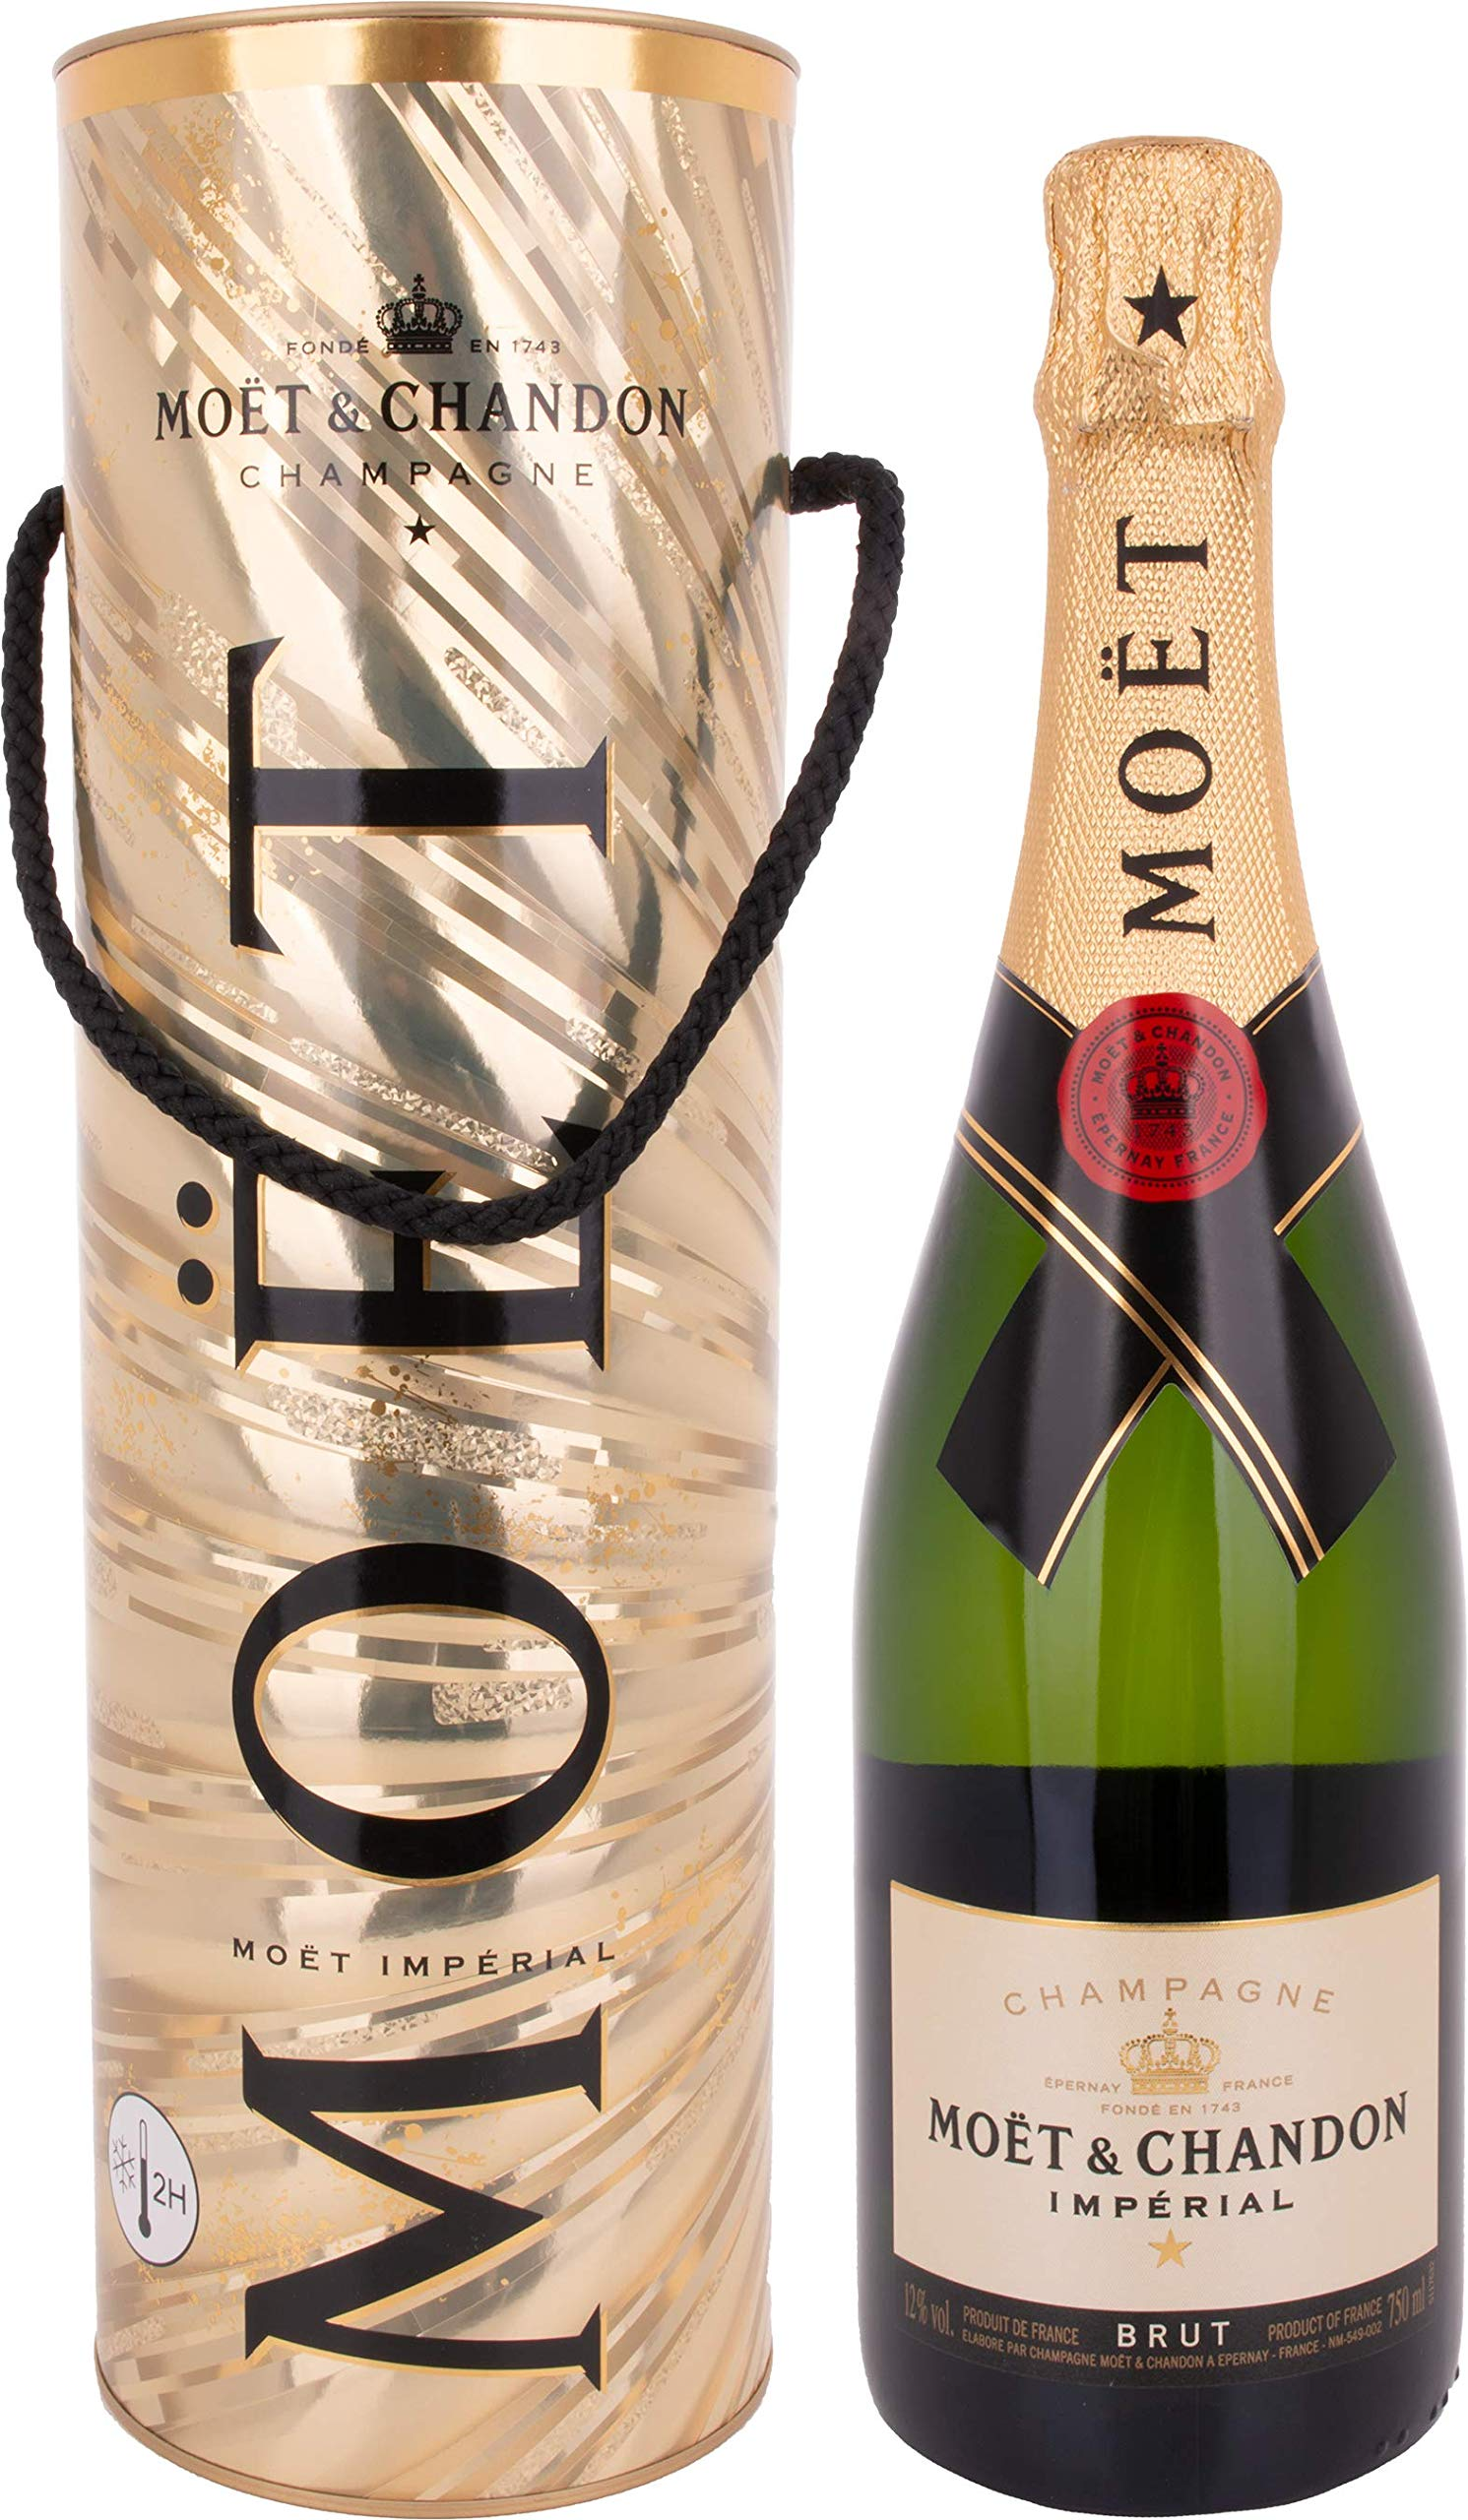 Mot-Chandon-Champagne-IMPRIAL-Brut-Champagner-1-x-075-l